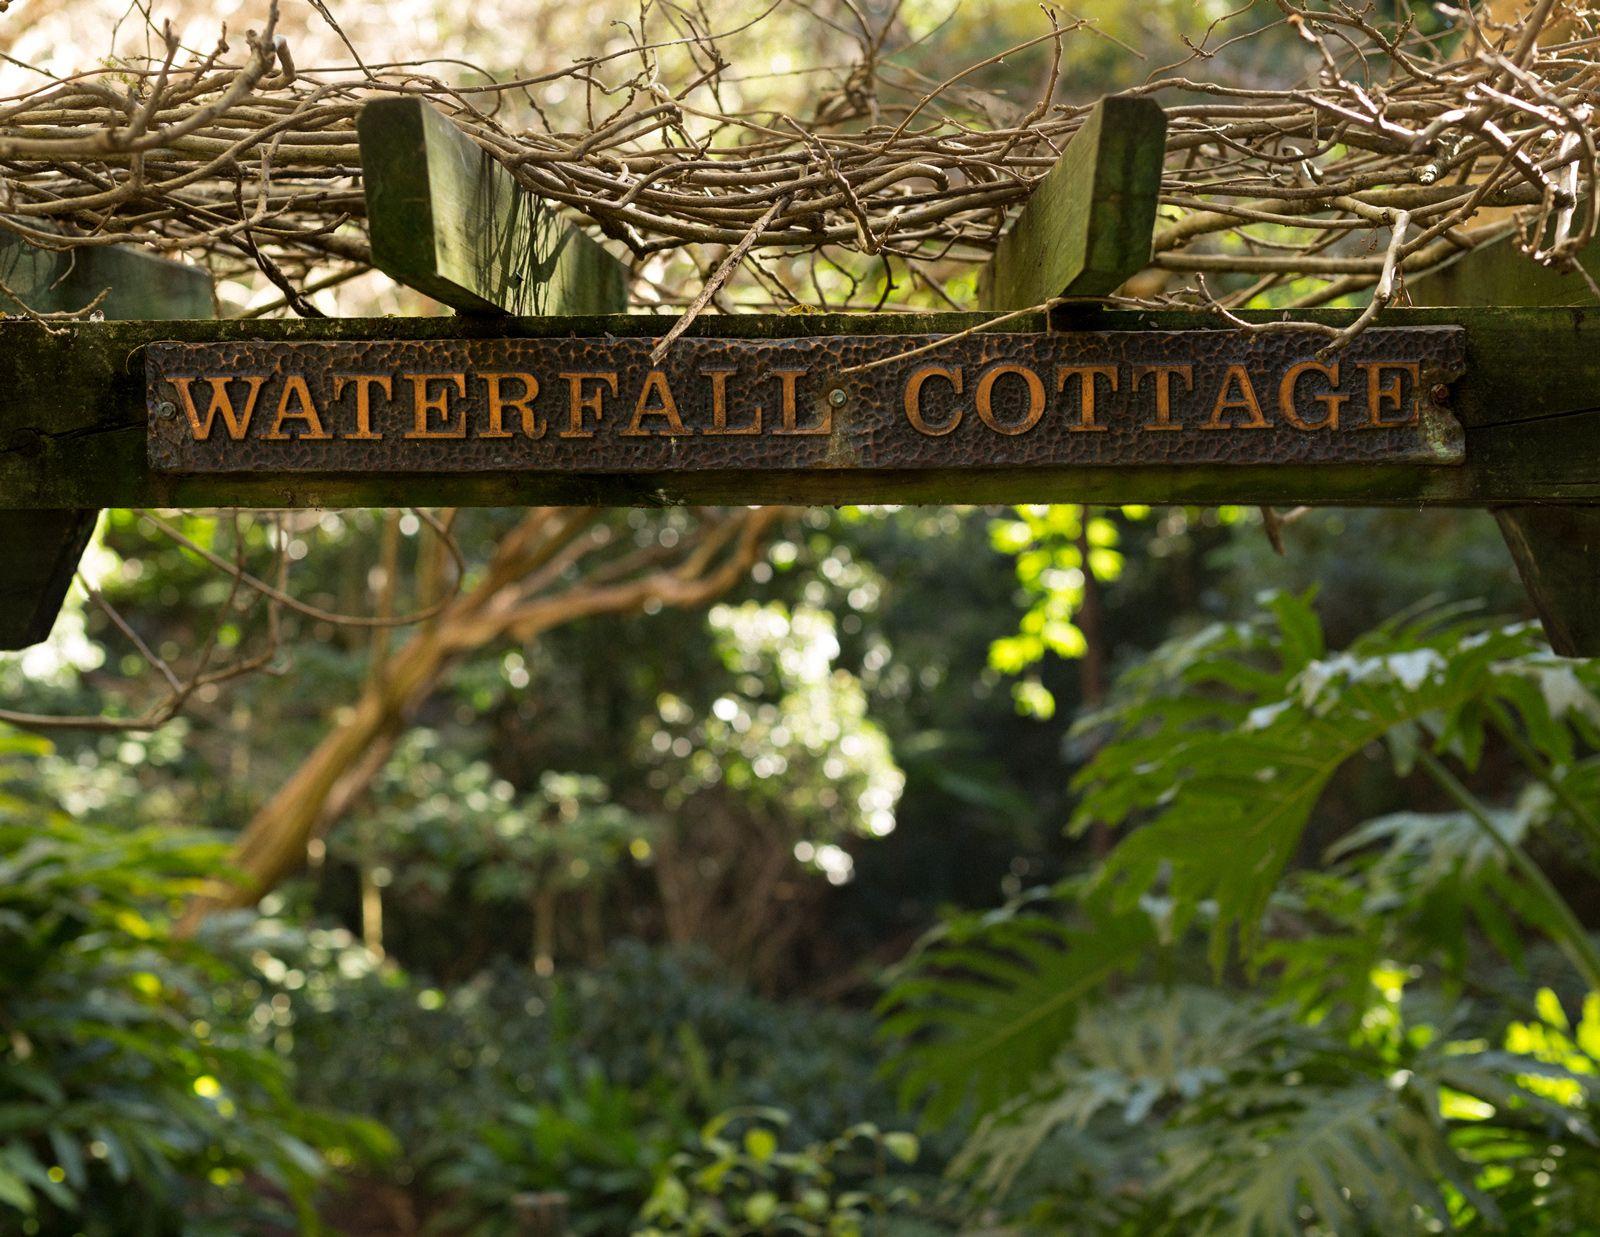 Waterfall Cottage: An Enchanted Garden | Garden waterfall and Gardens